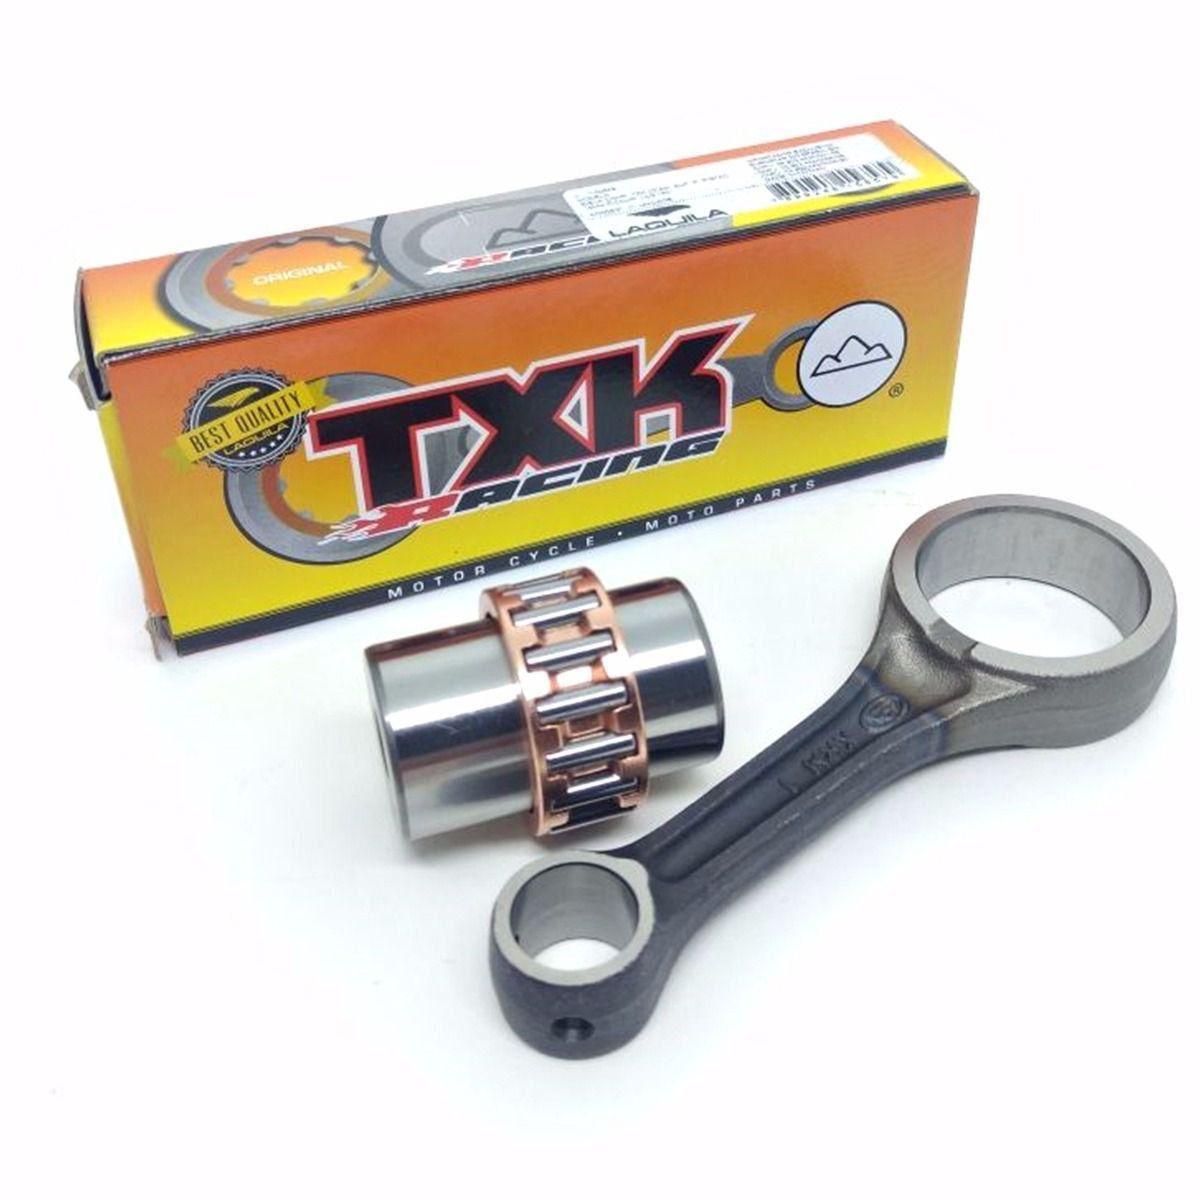 Biela Completa Txk Competição Pino 15mm Haste 2mm Curta Cg 150 Titan Fan Nxr bros 150